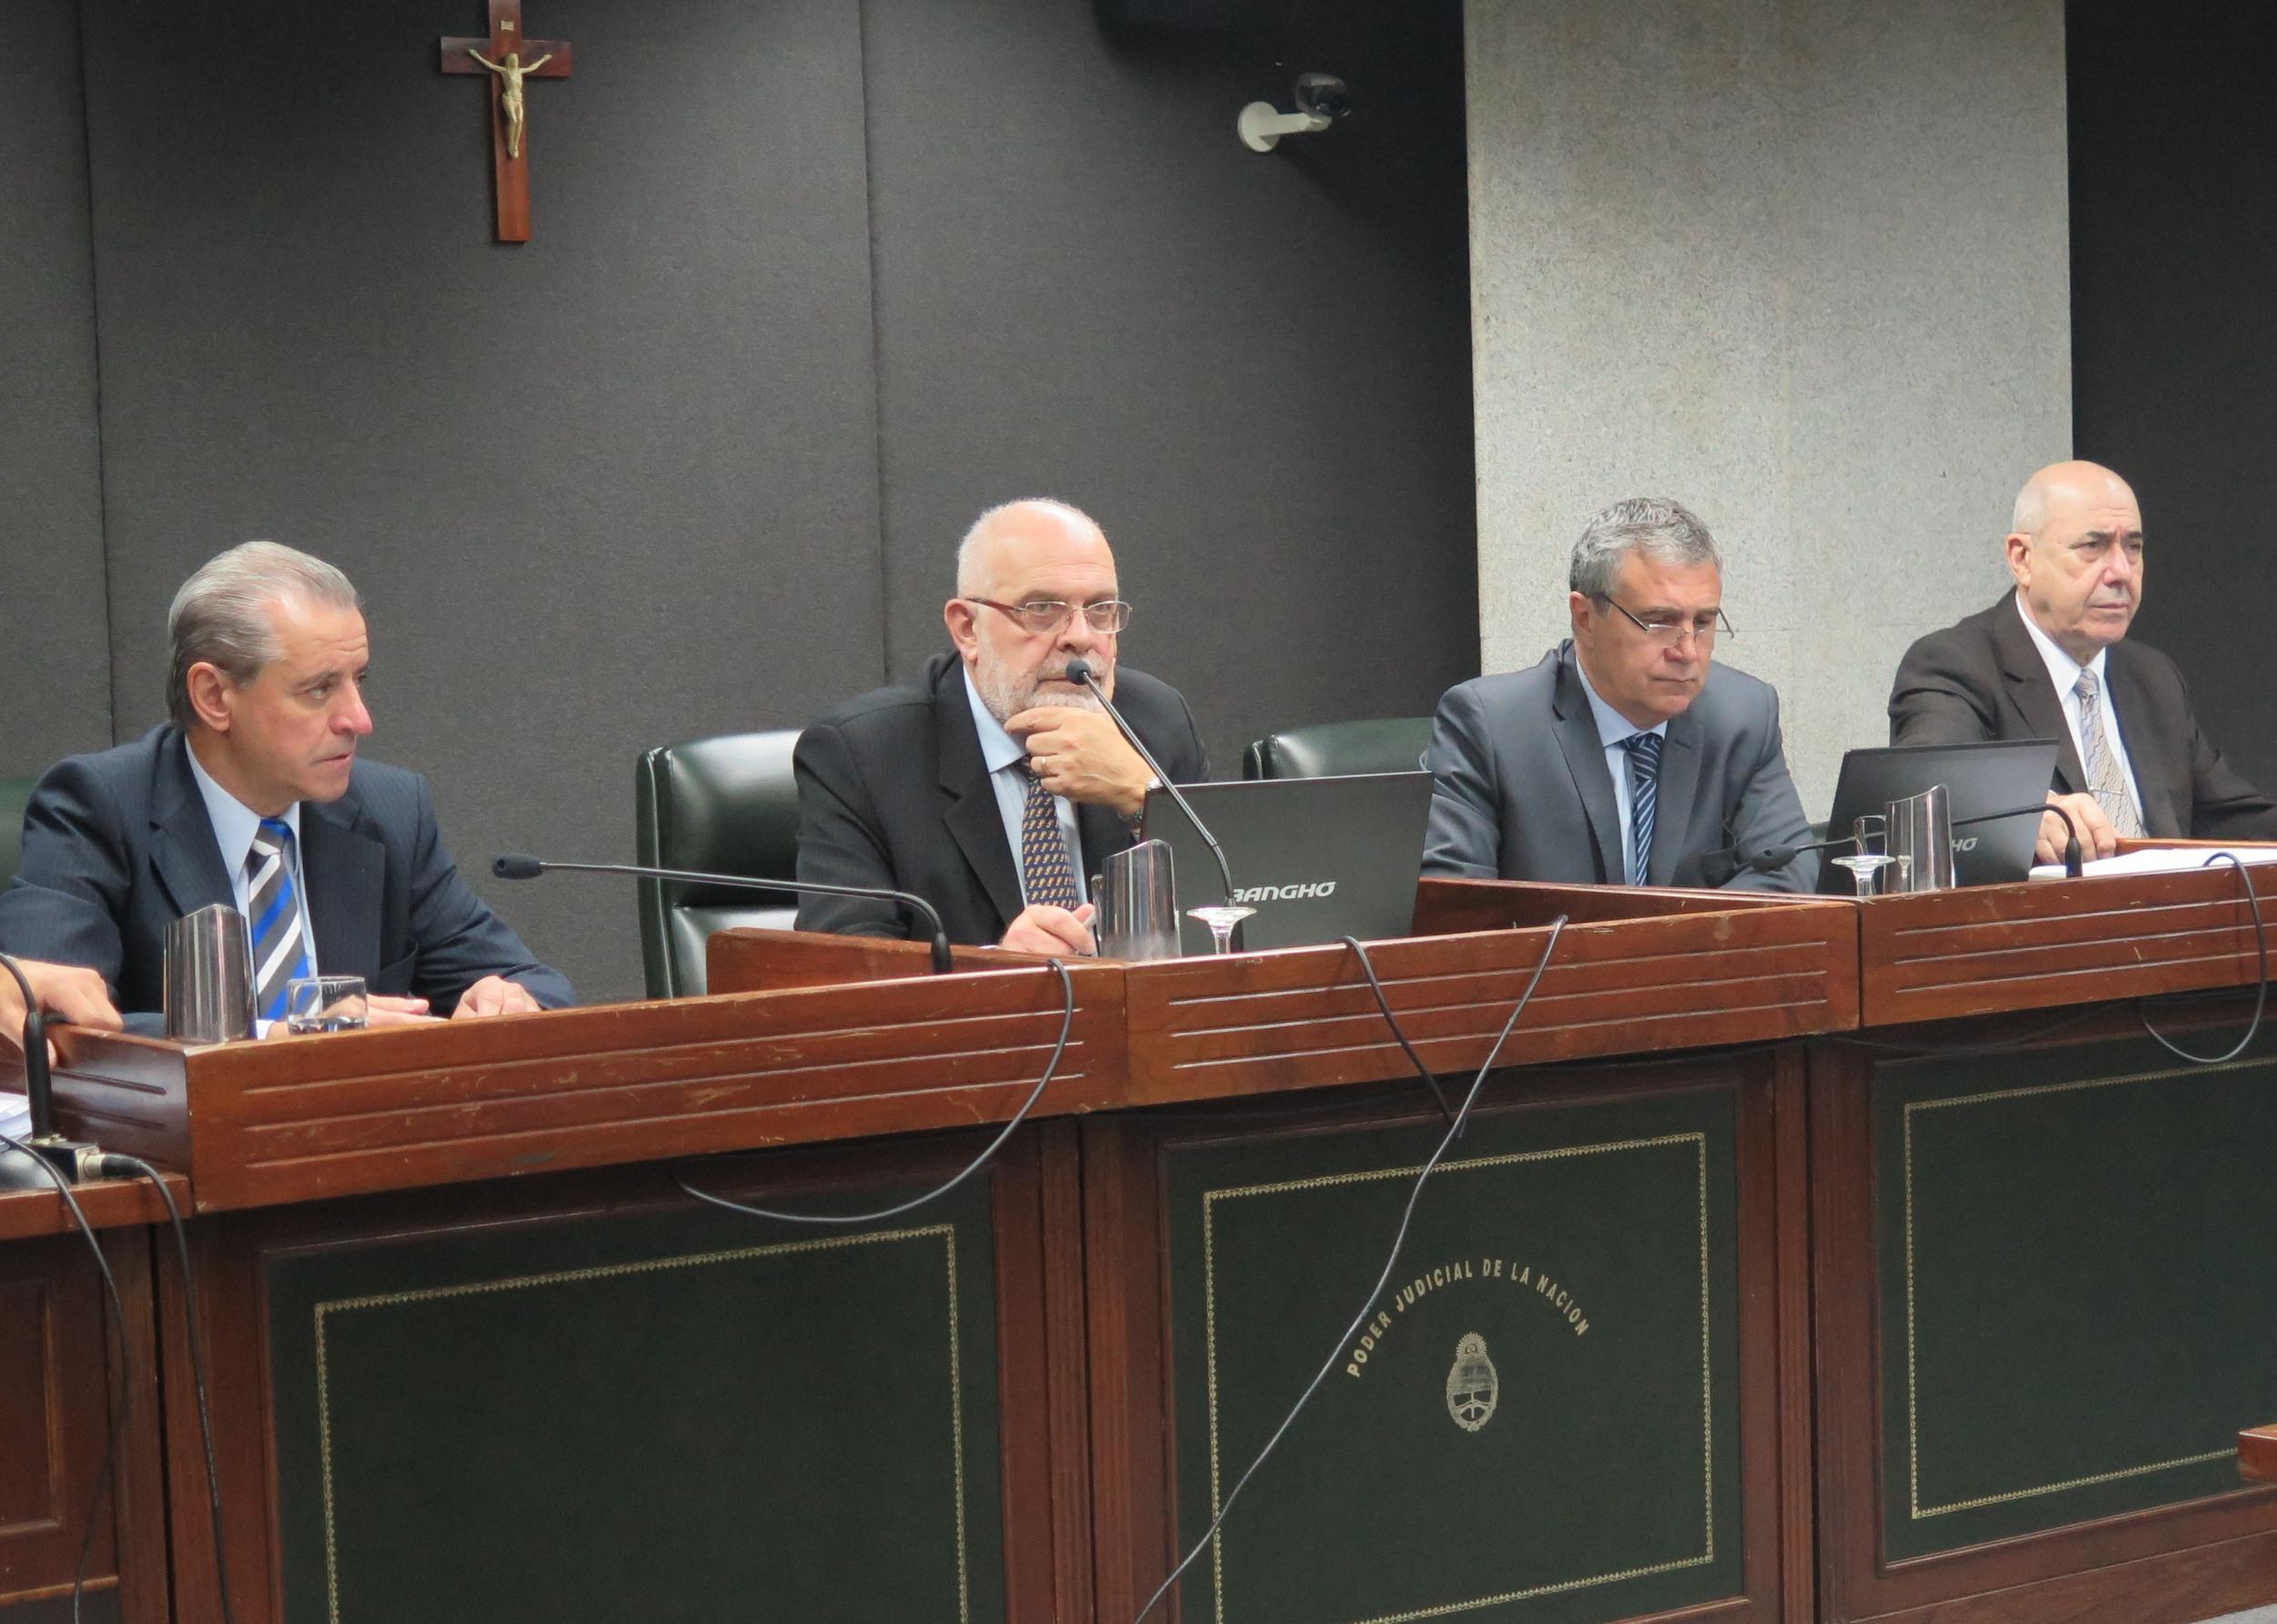 Foto: Belén Cano/ Ministerio Público Fiscal/www.fiscales.gob.ar